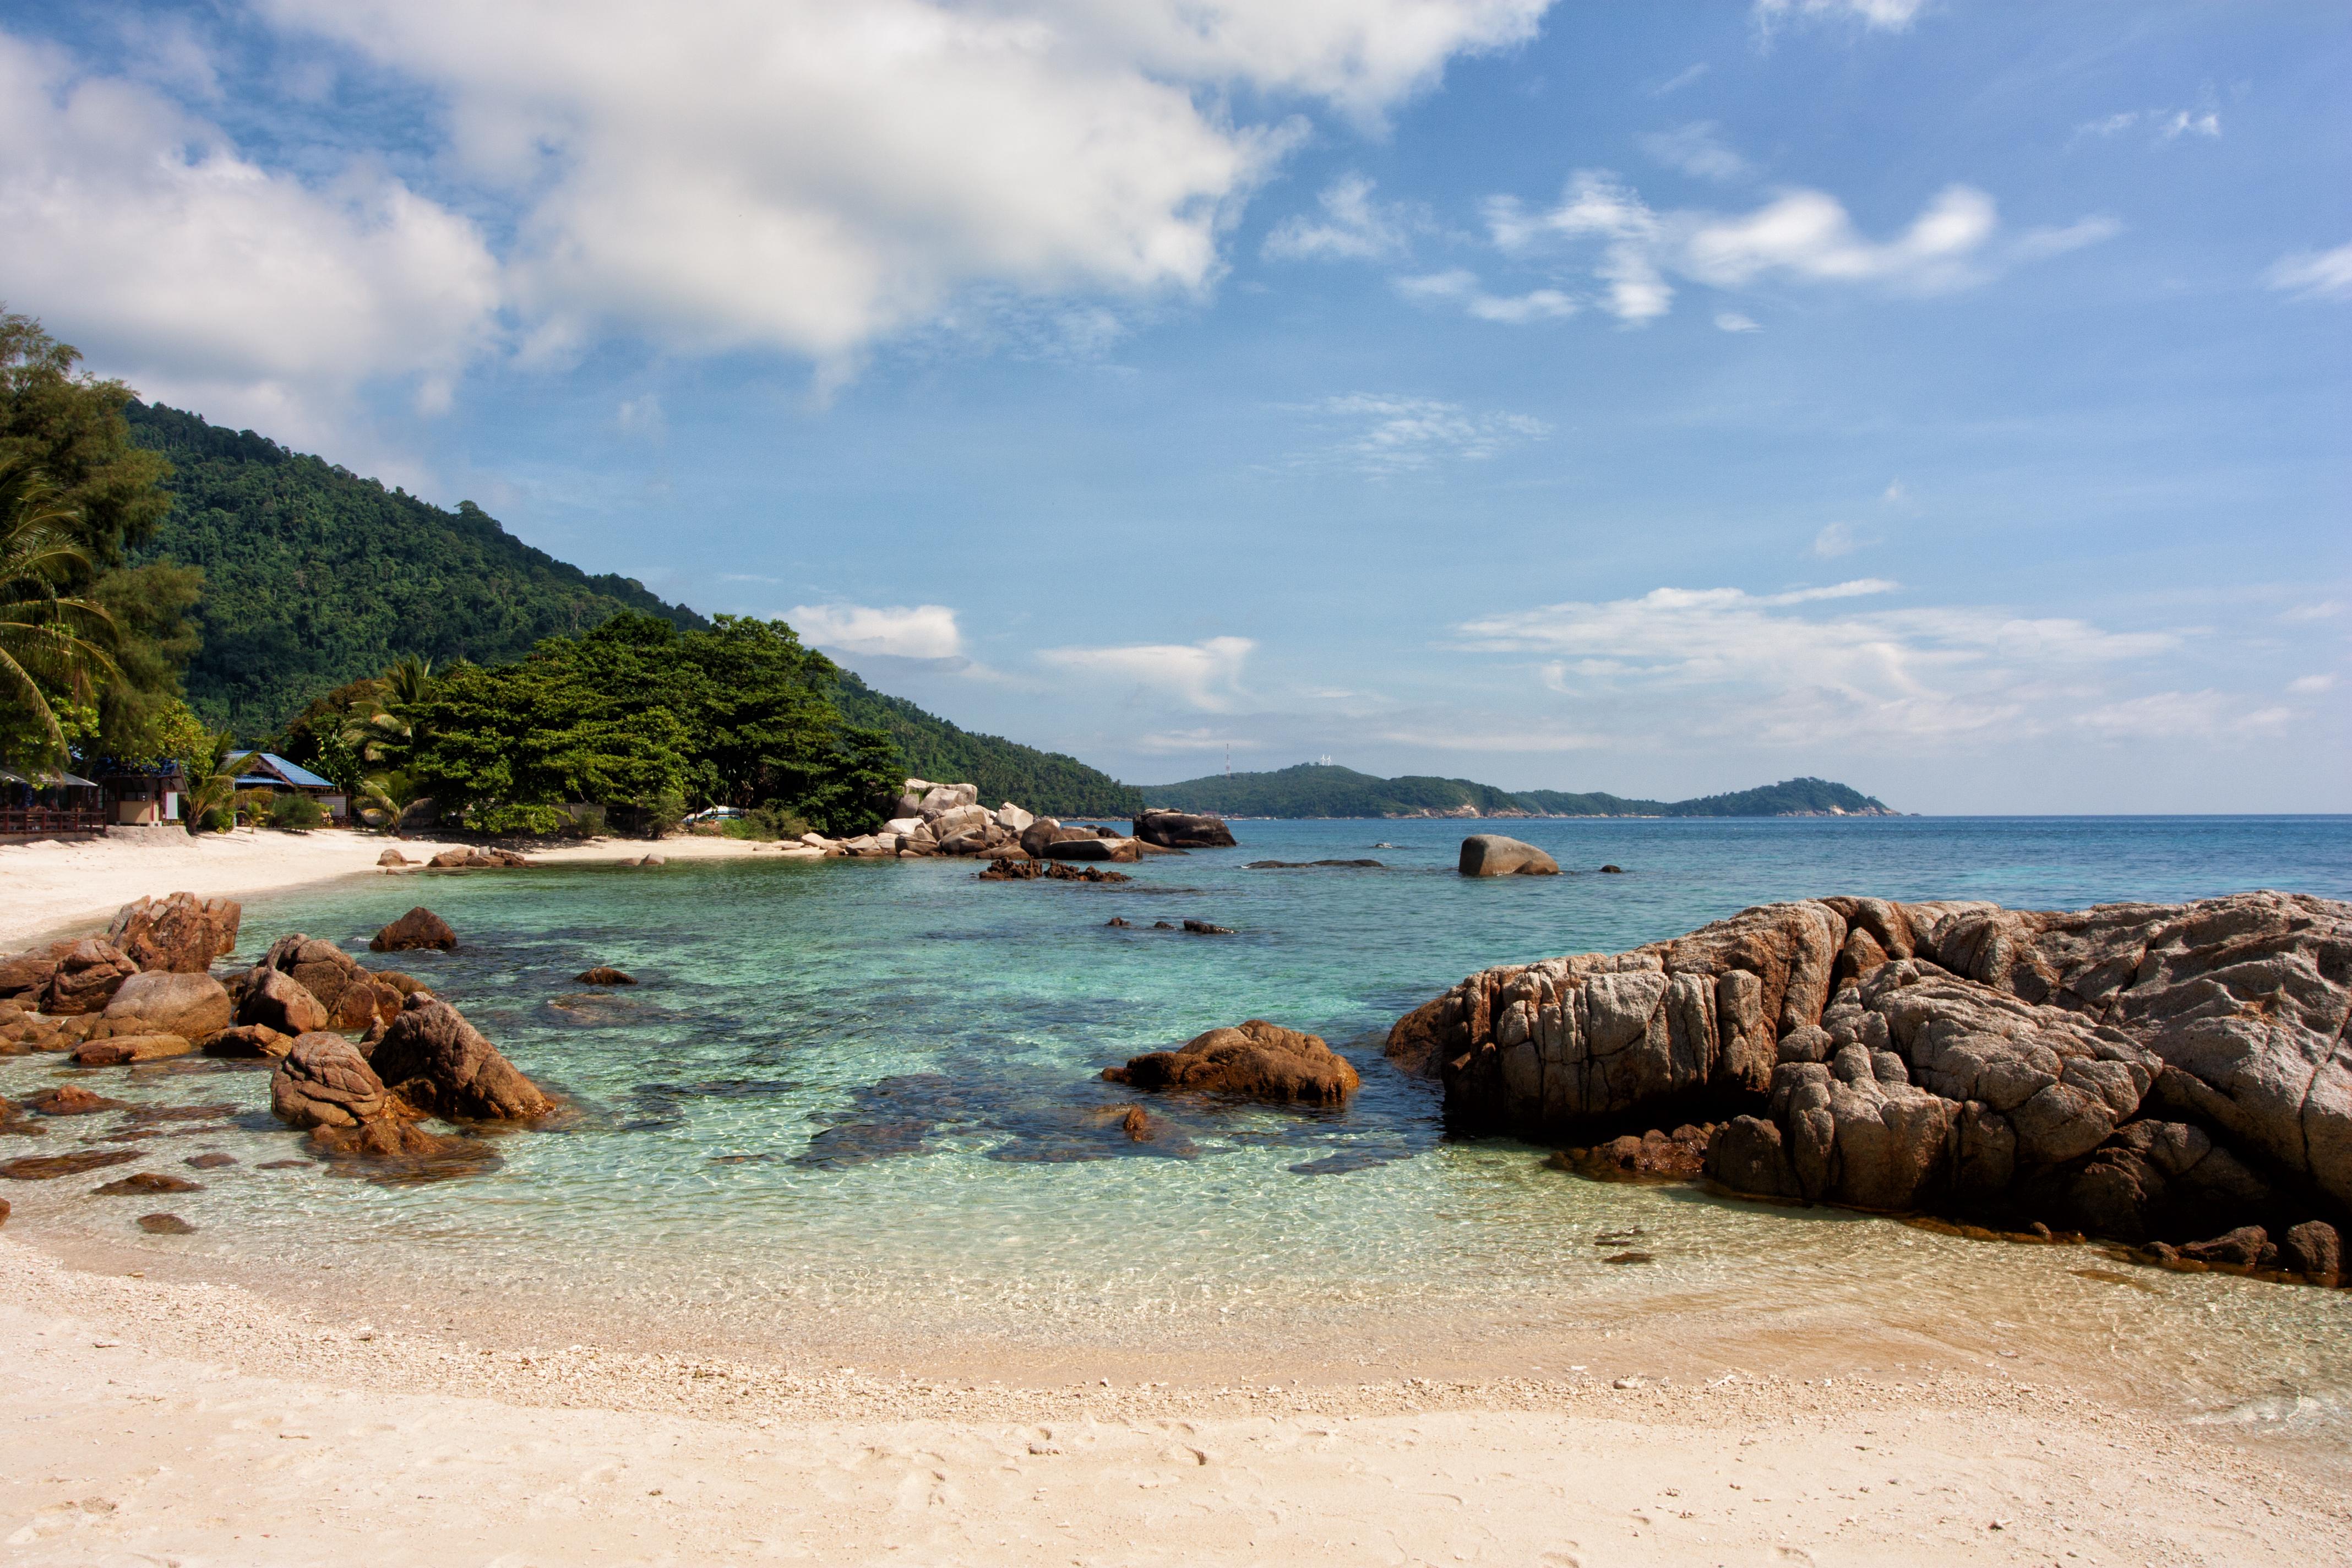 File:Rocky beach.jpg - Wikimedia Commons